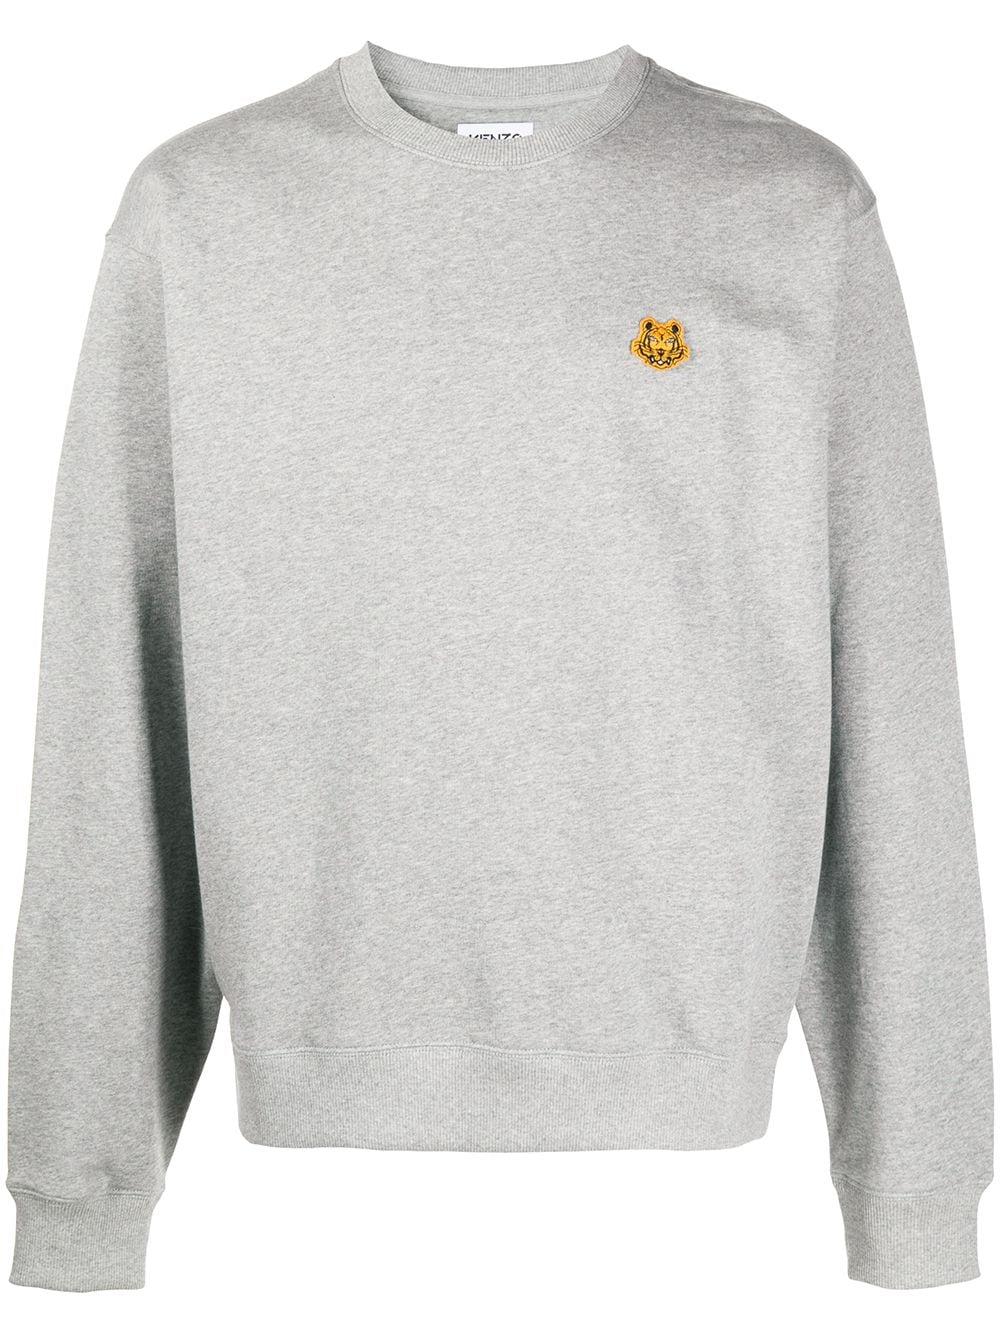 Kenzo Sweatshirt mit Tiger-Patch - Grau